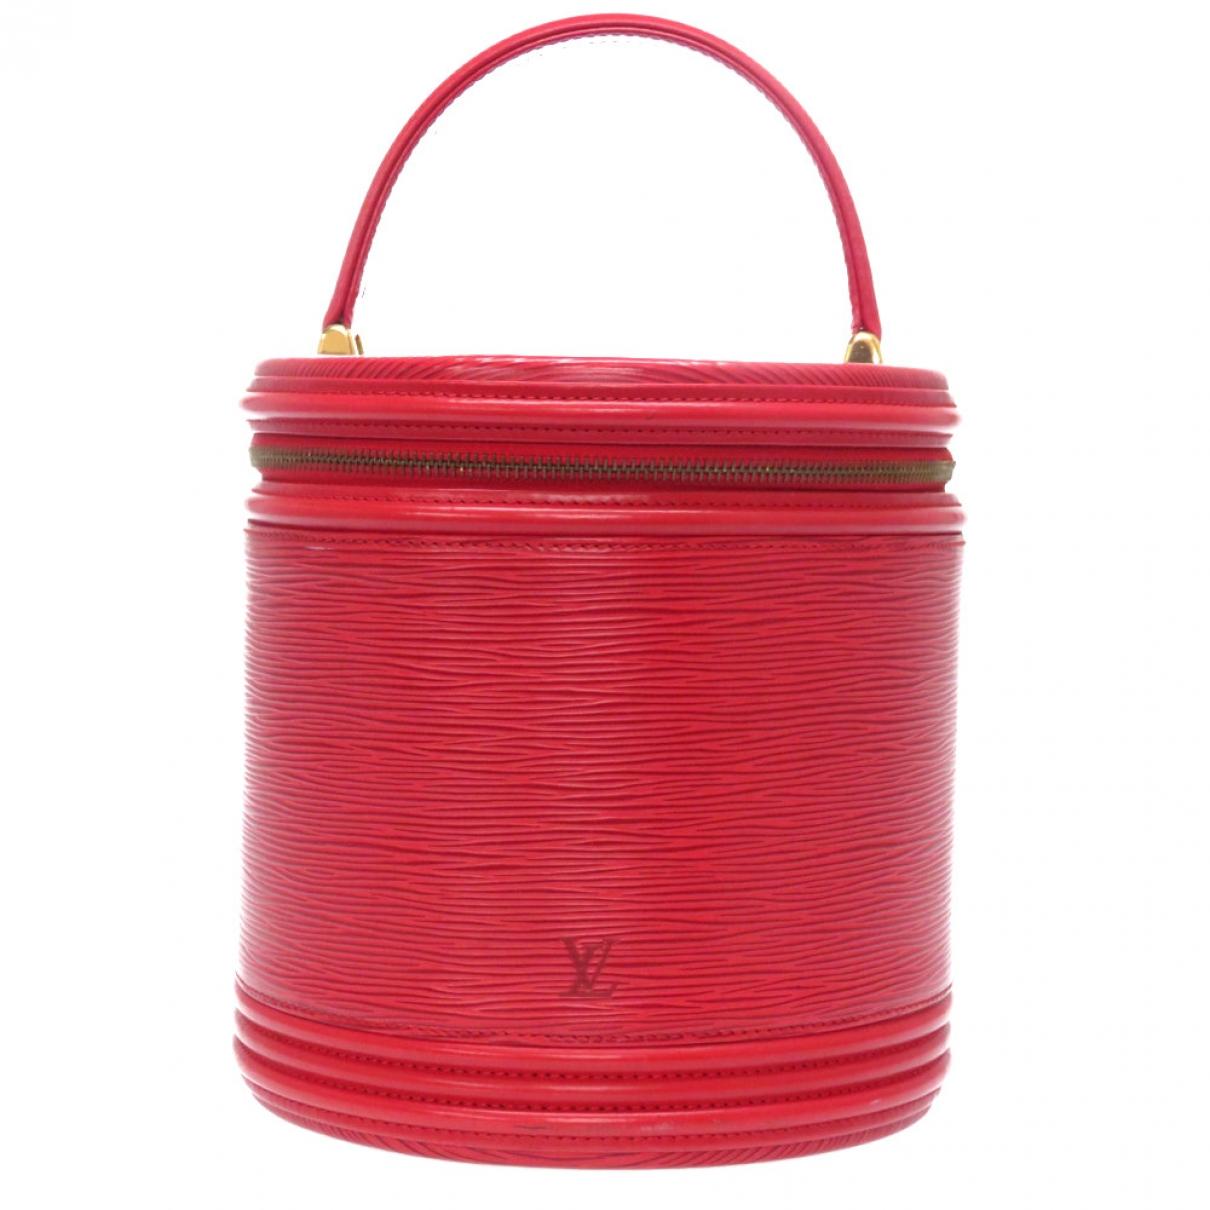 Louis Vuitton Cannes Handtasche in  Rot Leder